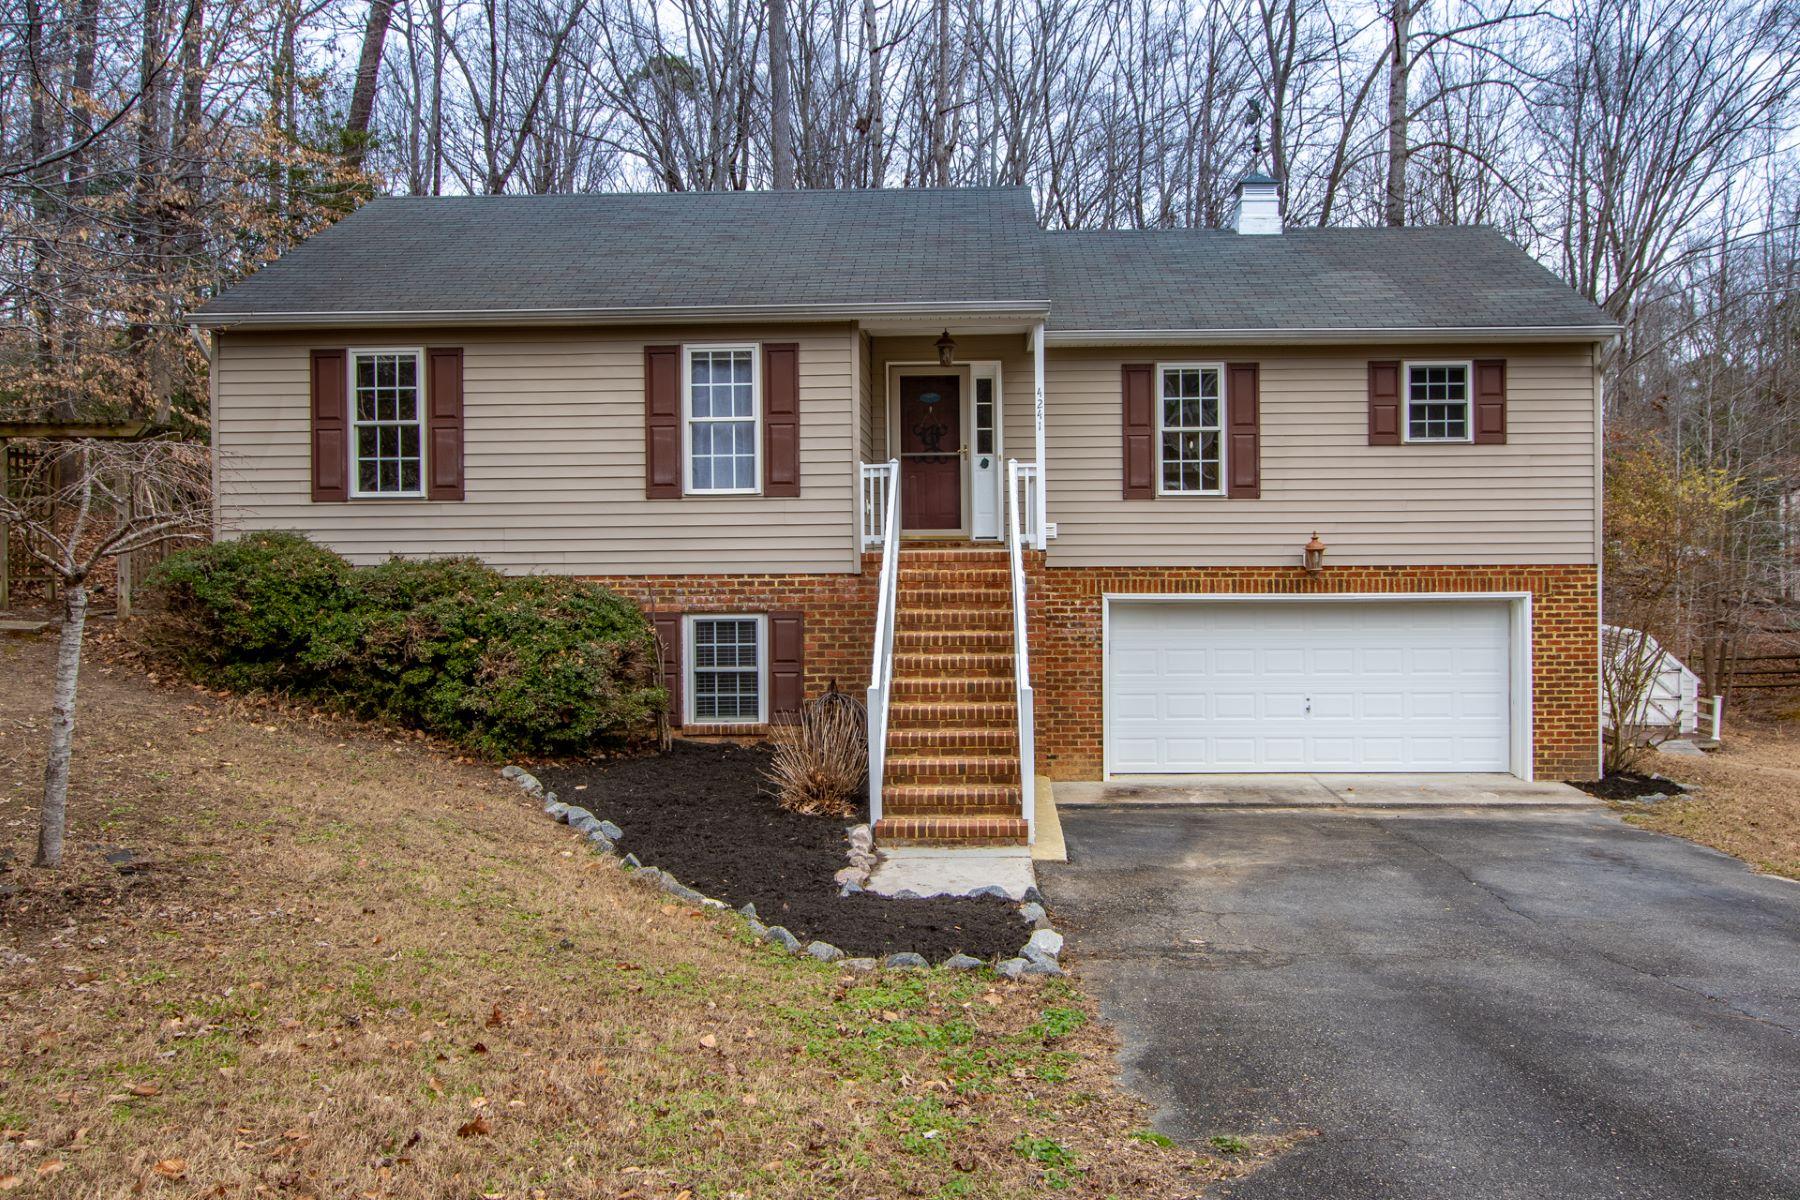 Single Family Home for Sale at Adams Hunt 4241 Birdella Drive Williamsburg, Virginia 23188 United States